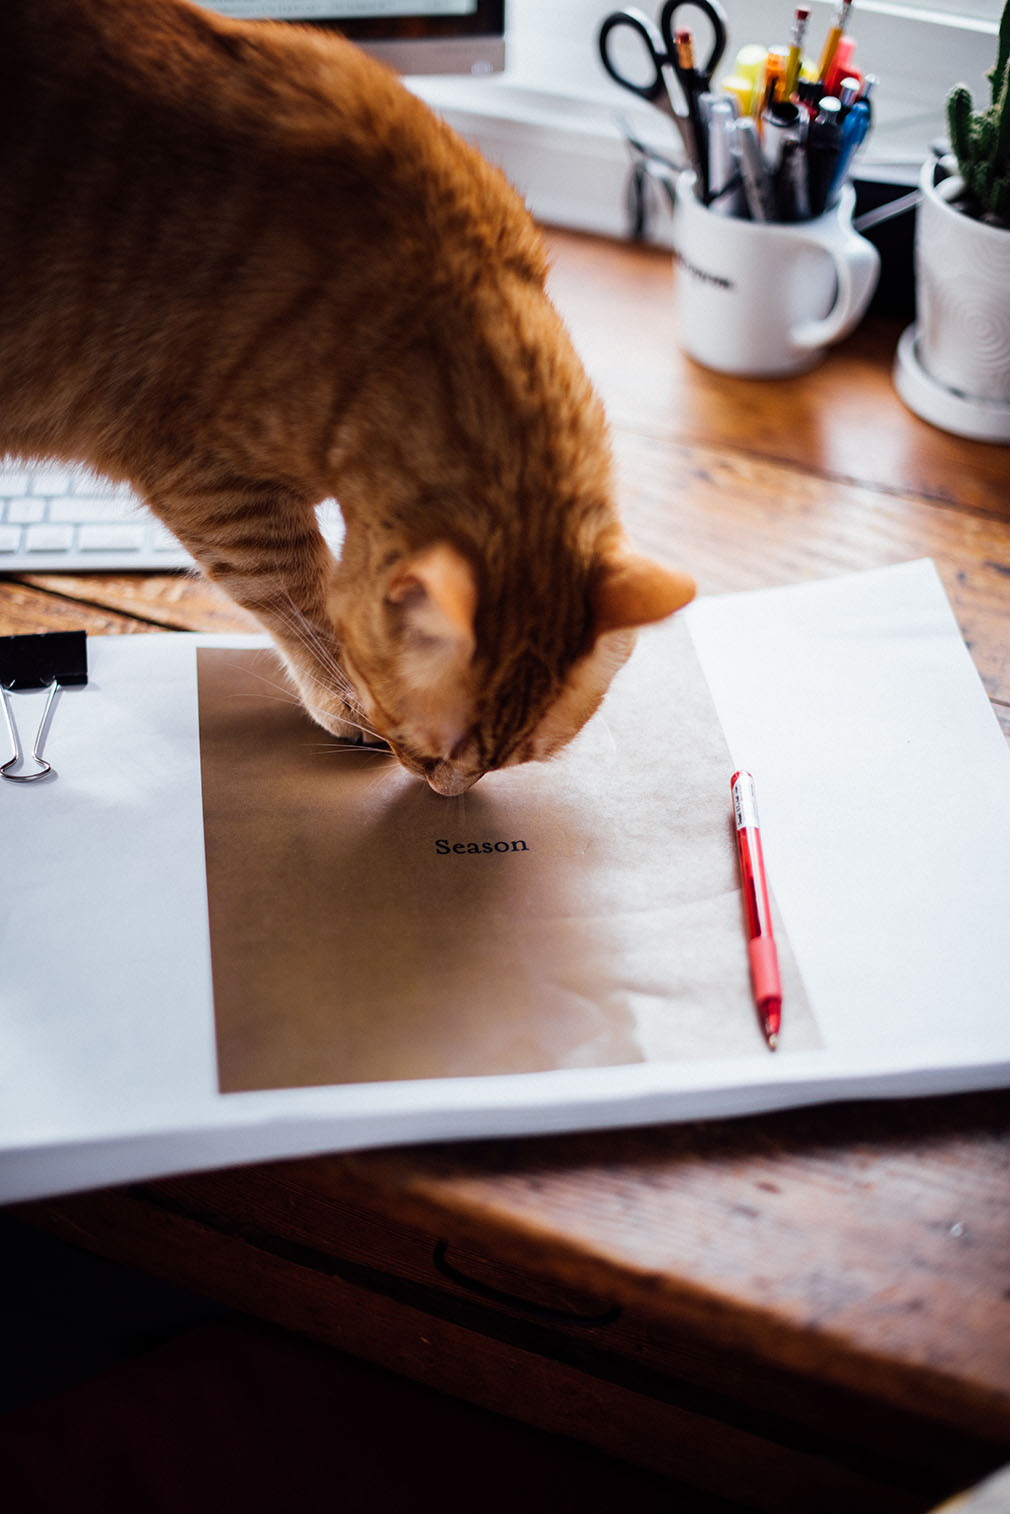 Season - The Book Diaries - Part II - Writing | Nik Sharma